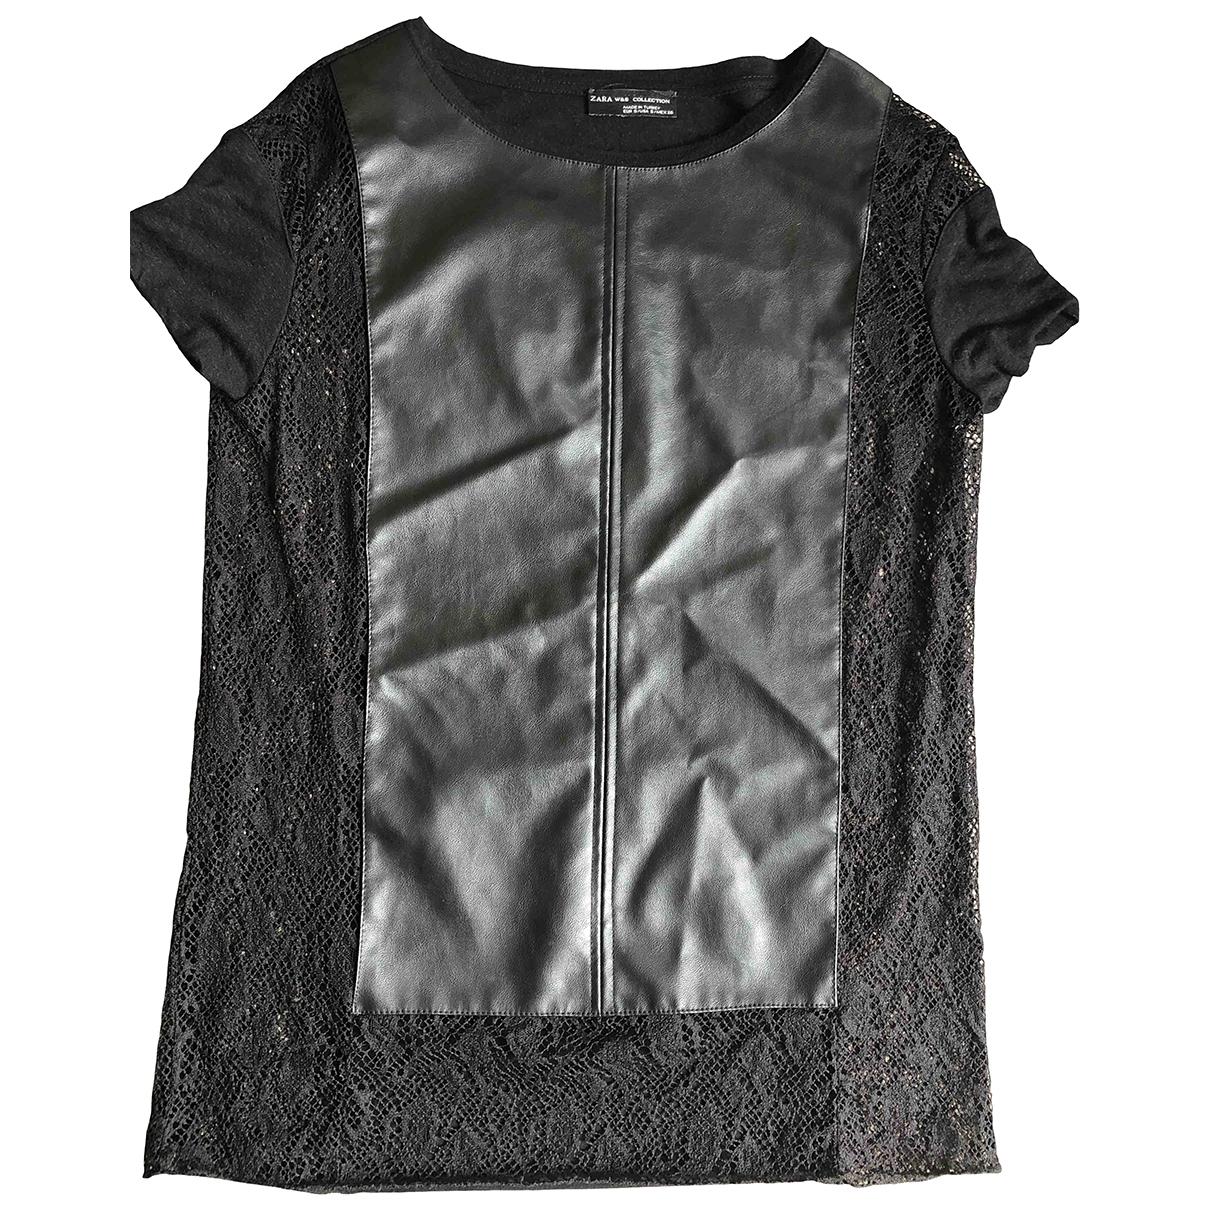 Zara - Top   pour femme en dentelle - noir